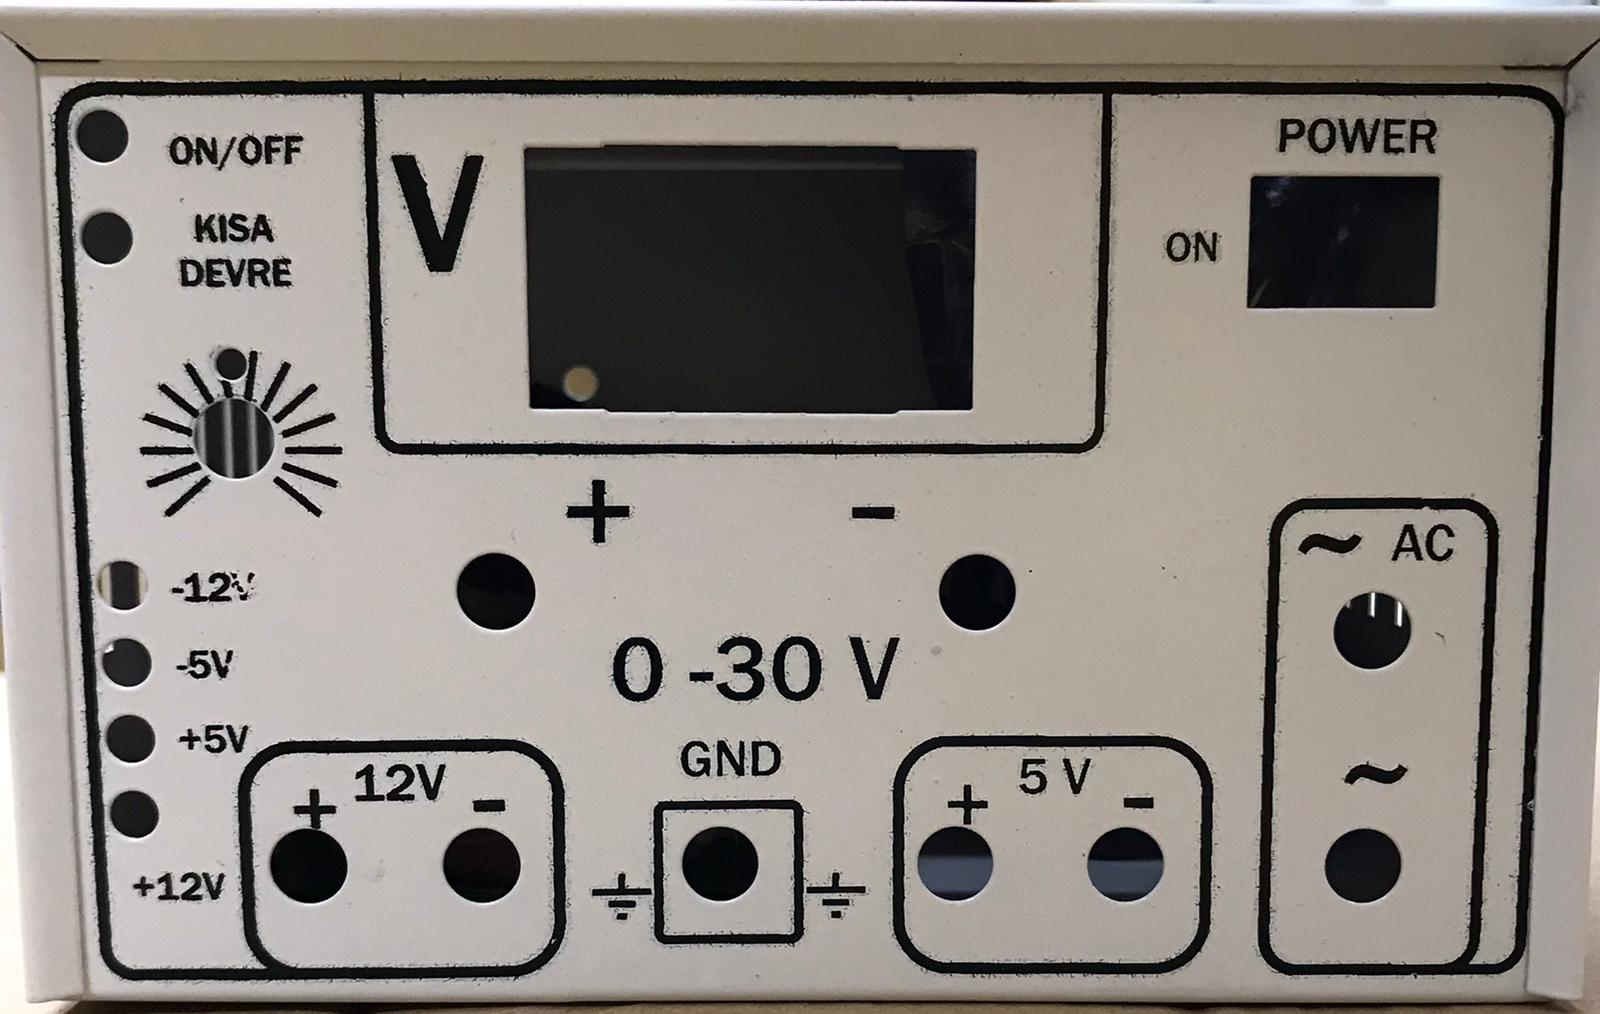 0 - 30V Ayarlı Demonte Güç Kaynağı (Simetrik besleme +/- 12V ve +/- 5V ile) resmi 1